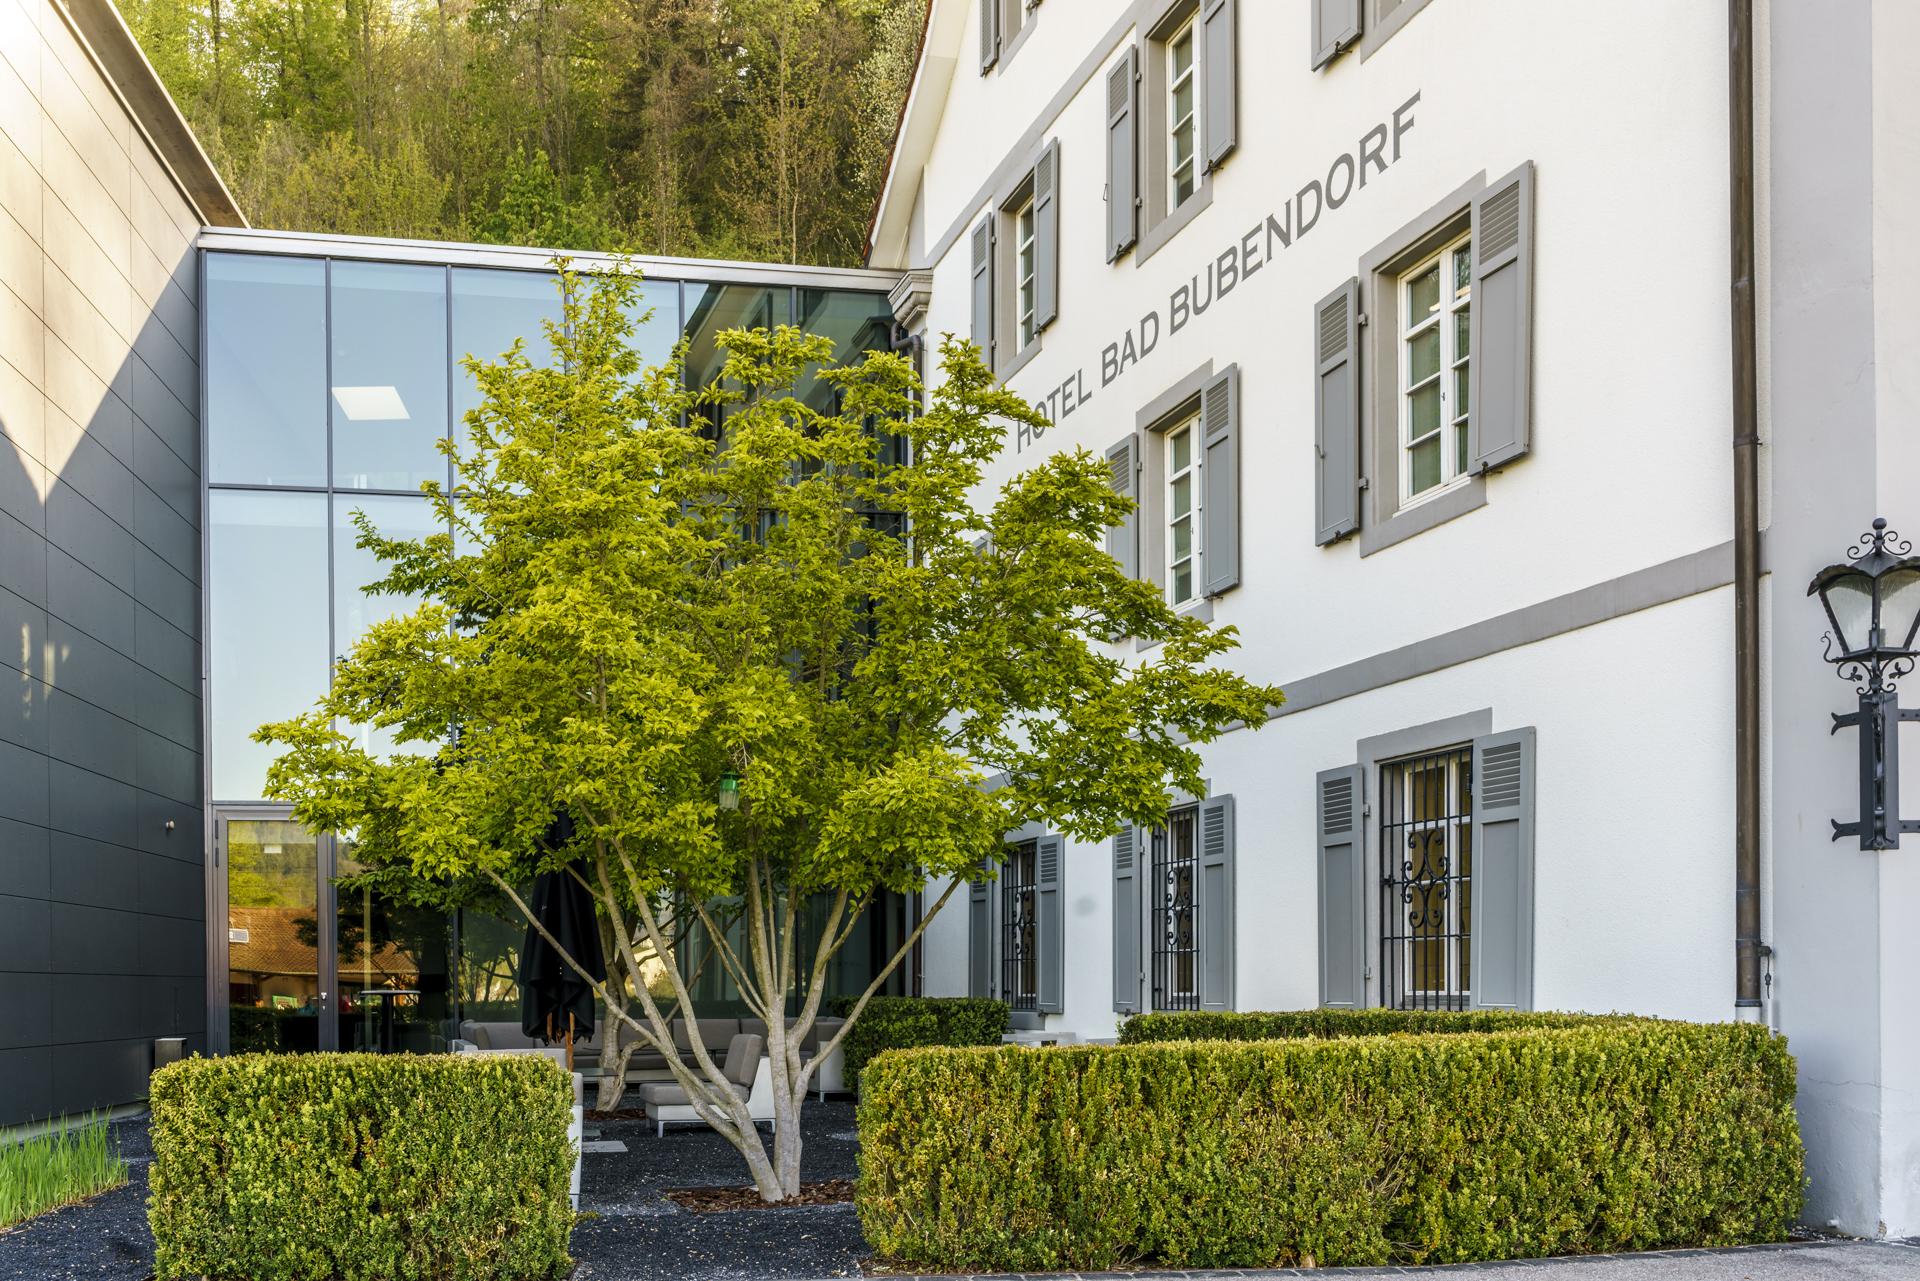 Hotel Bad Bubendorf Garten